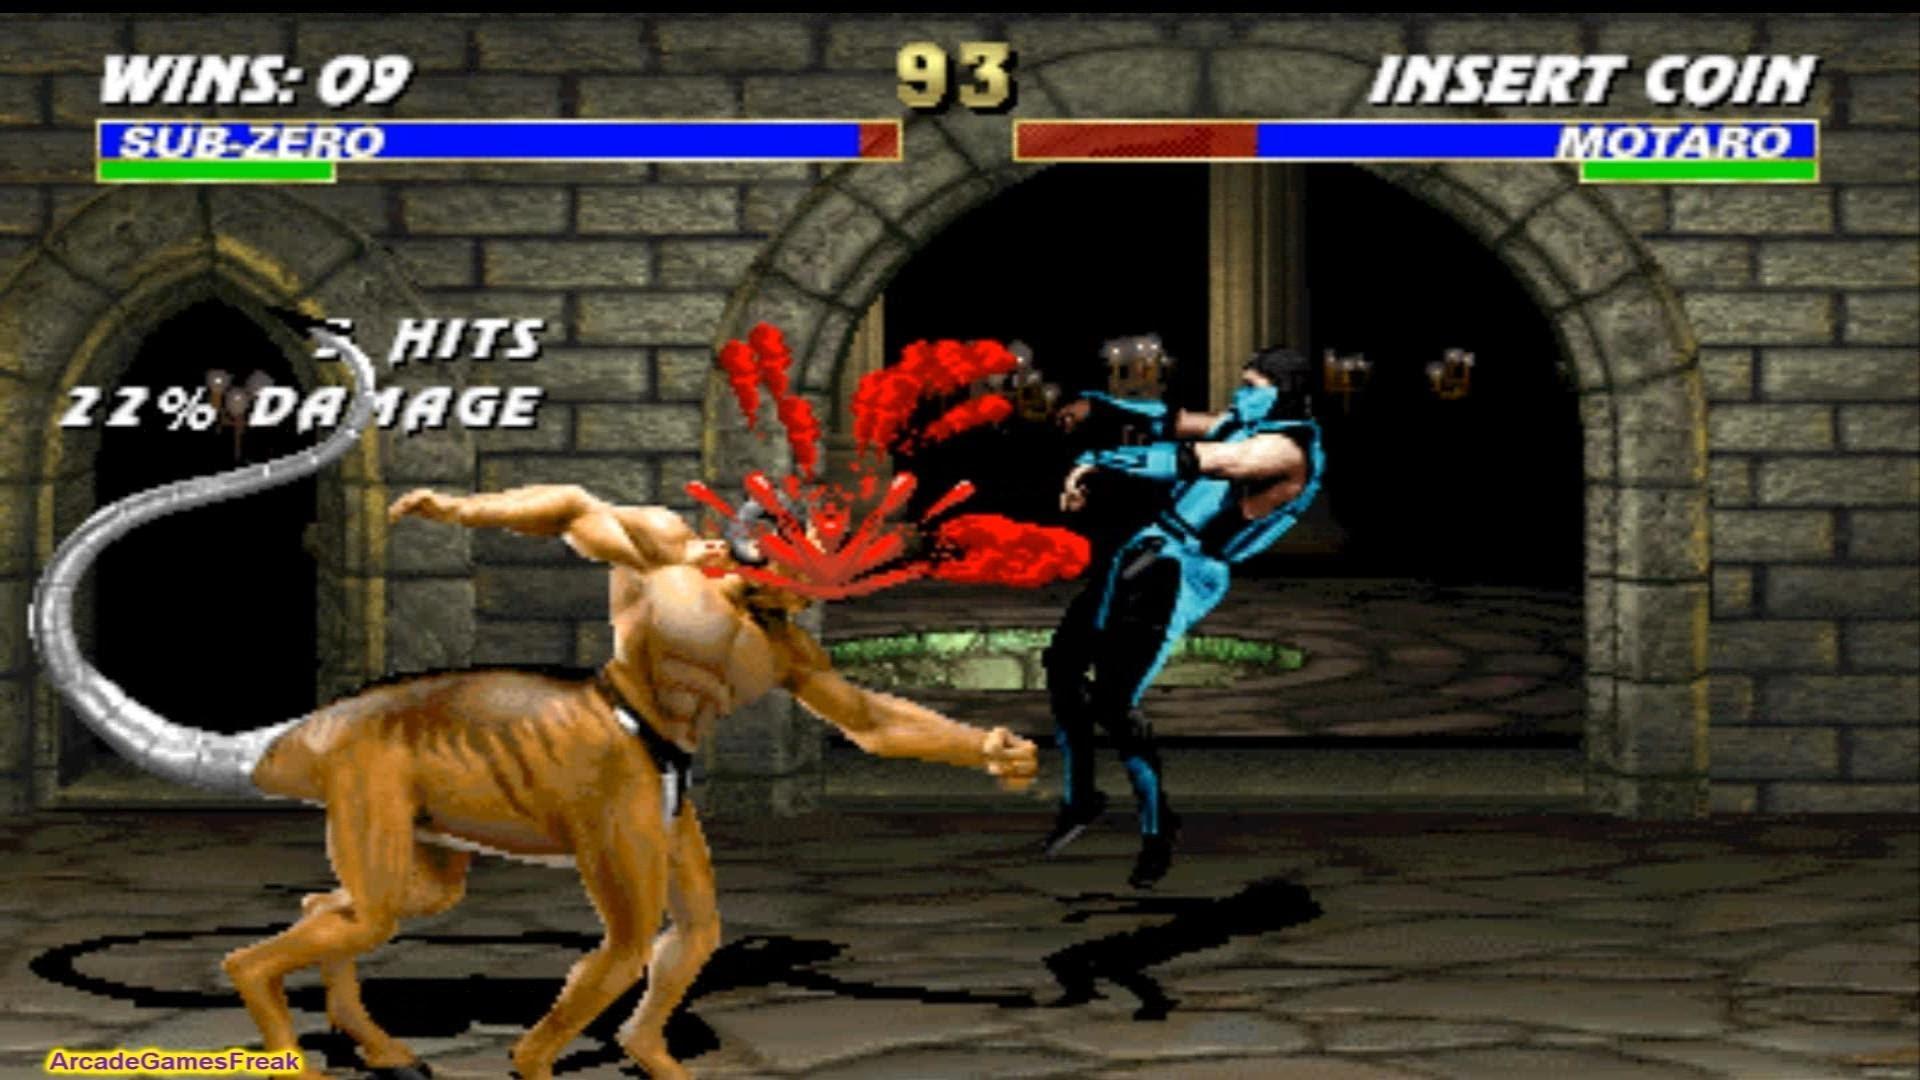 Mortal Kombat 3 wallpapers, Video Game, HQ Mortal Kombat 3